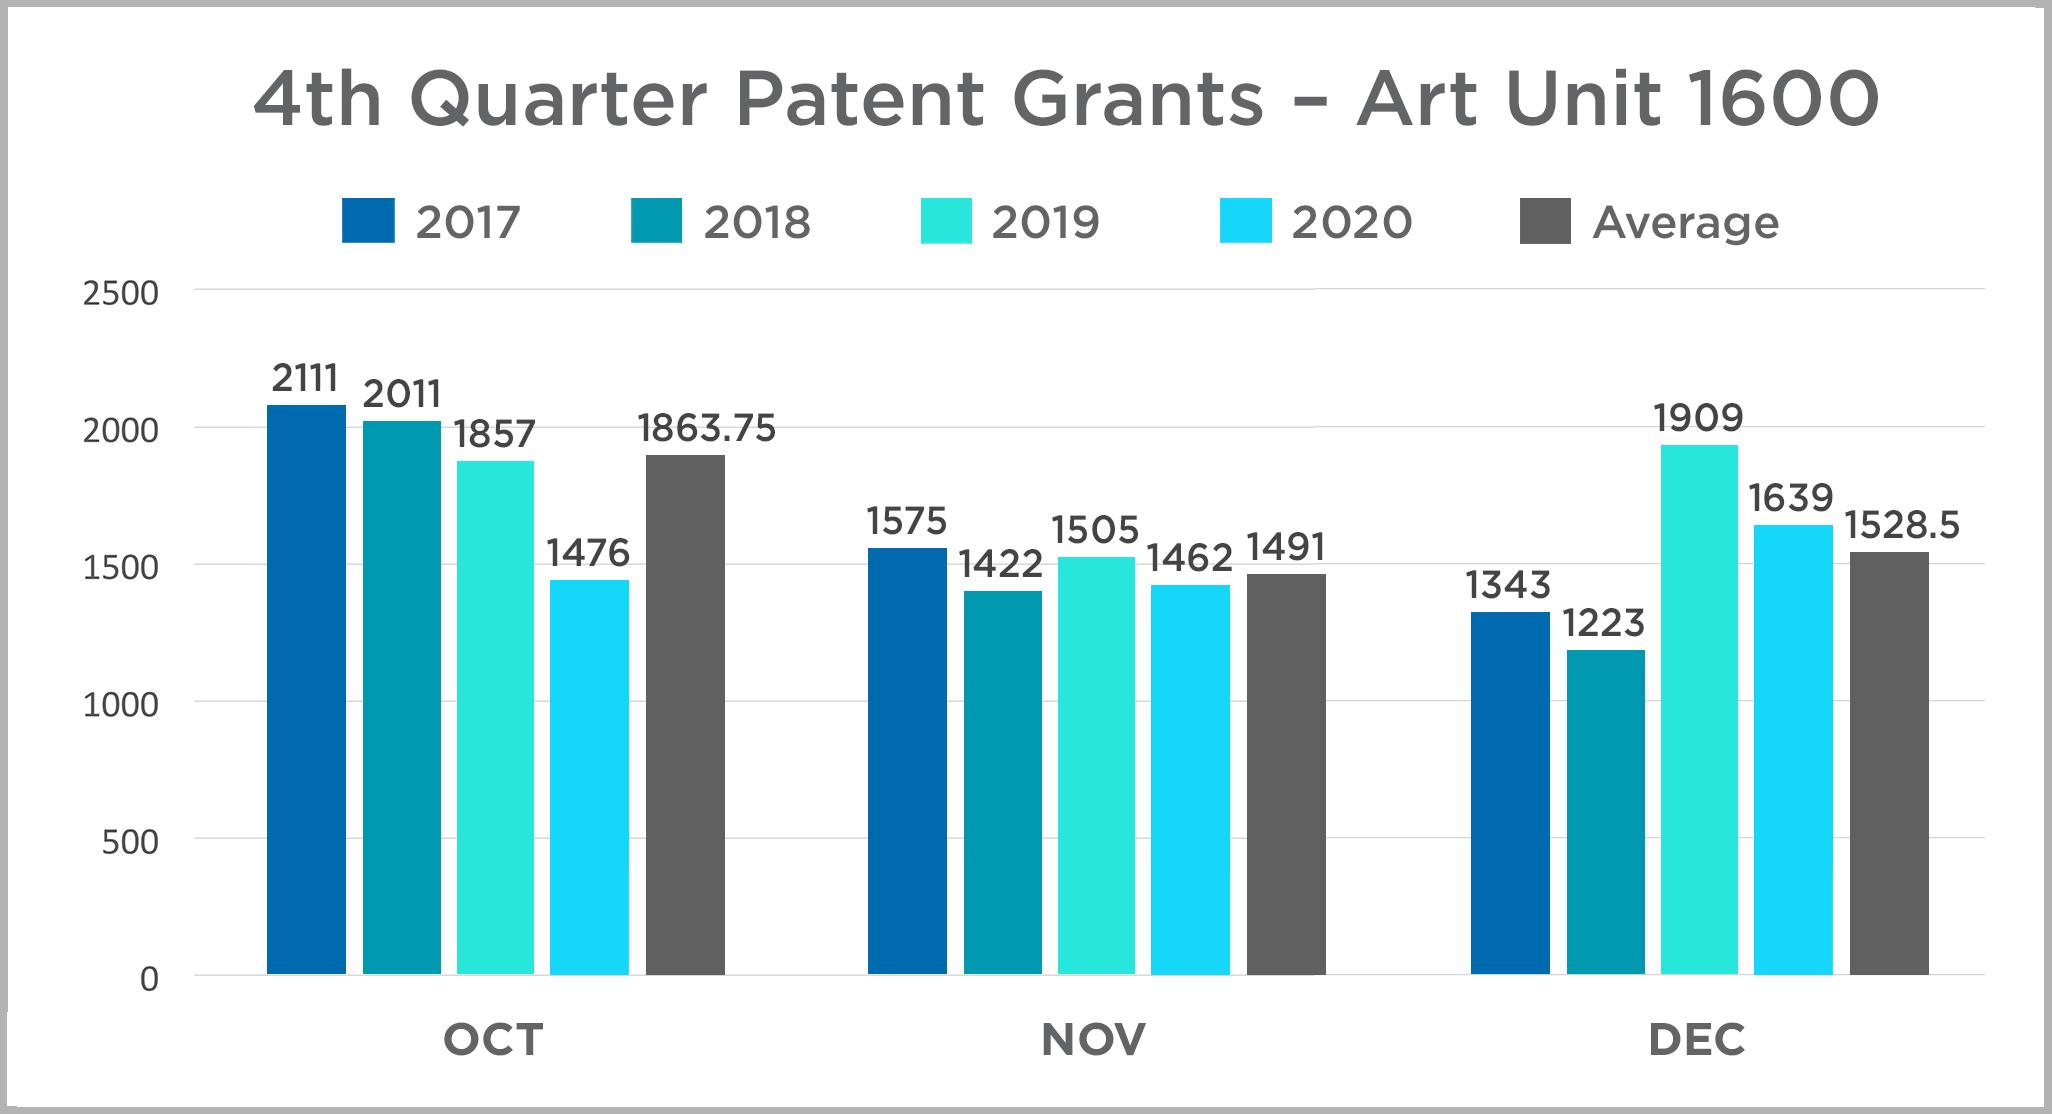 4th quarter patent grants Art Unit 1600